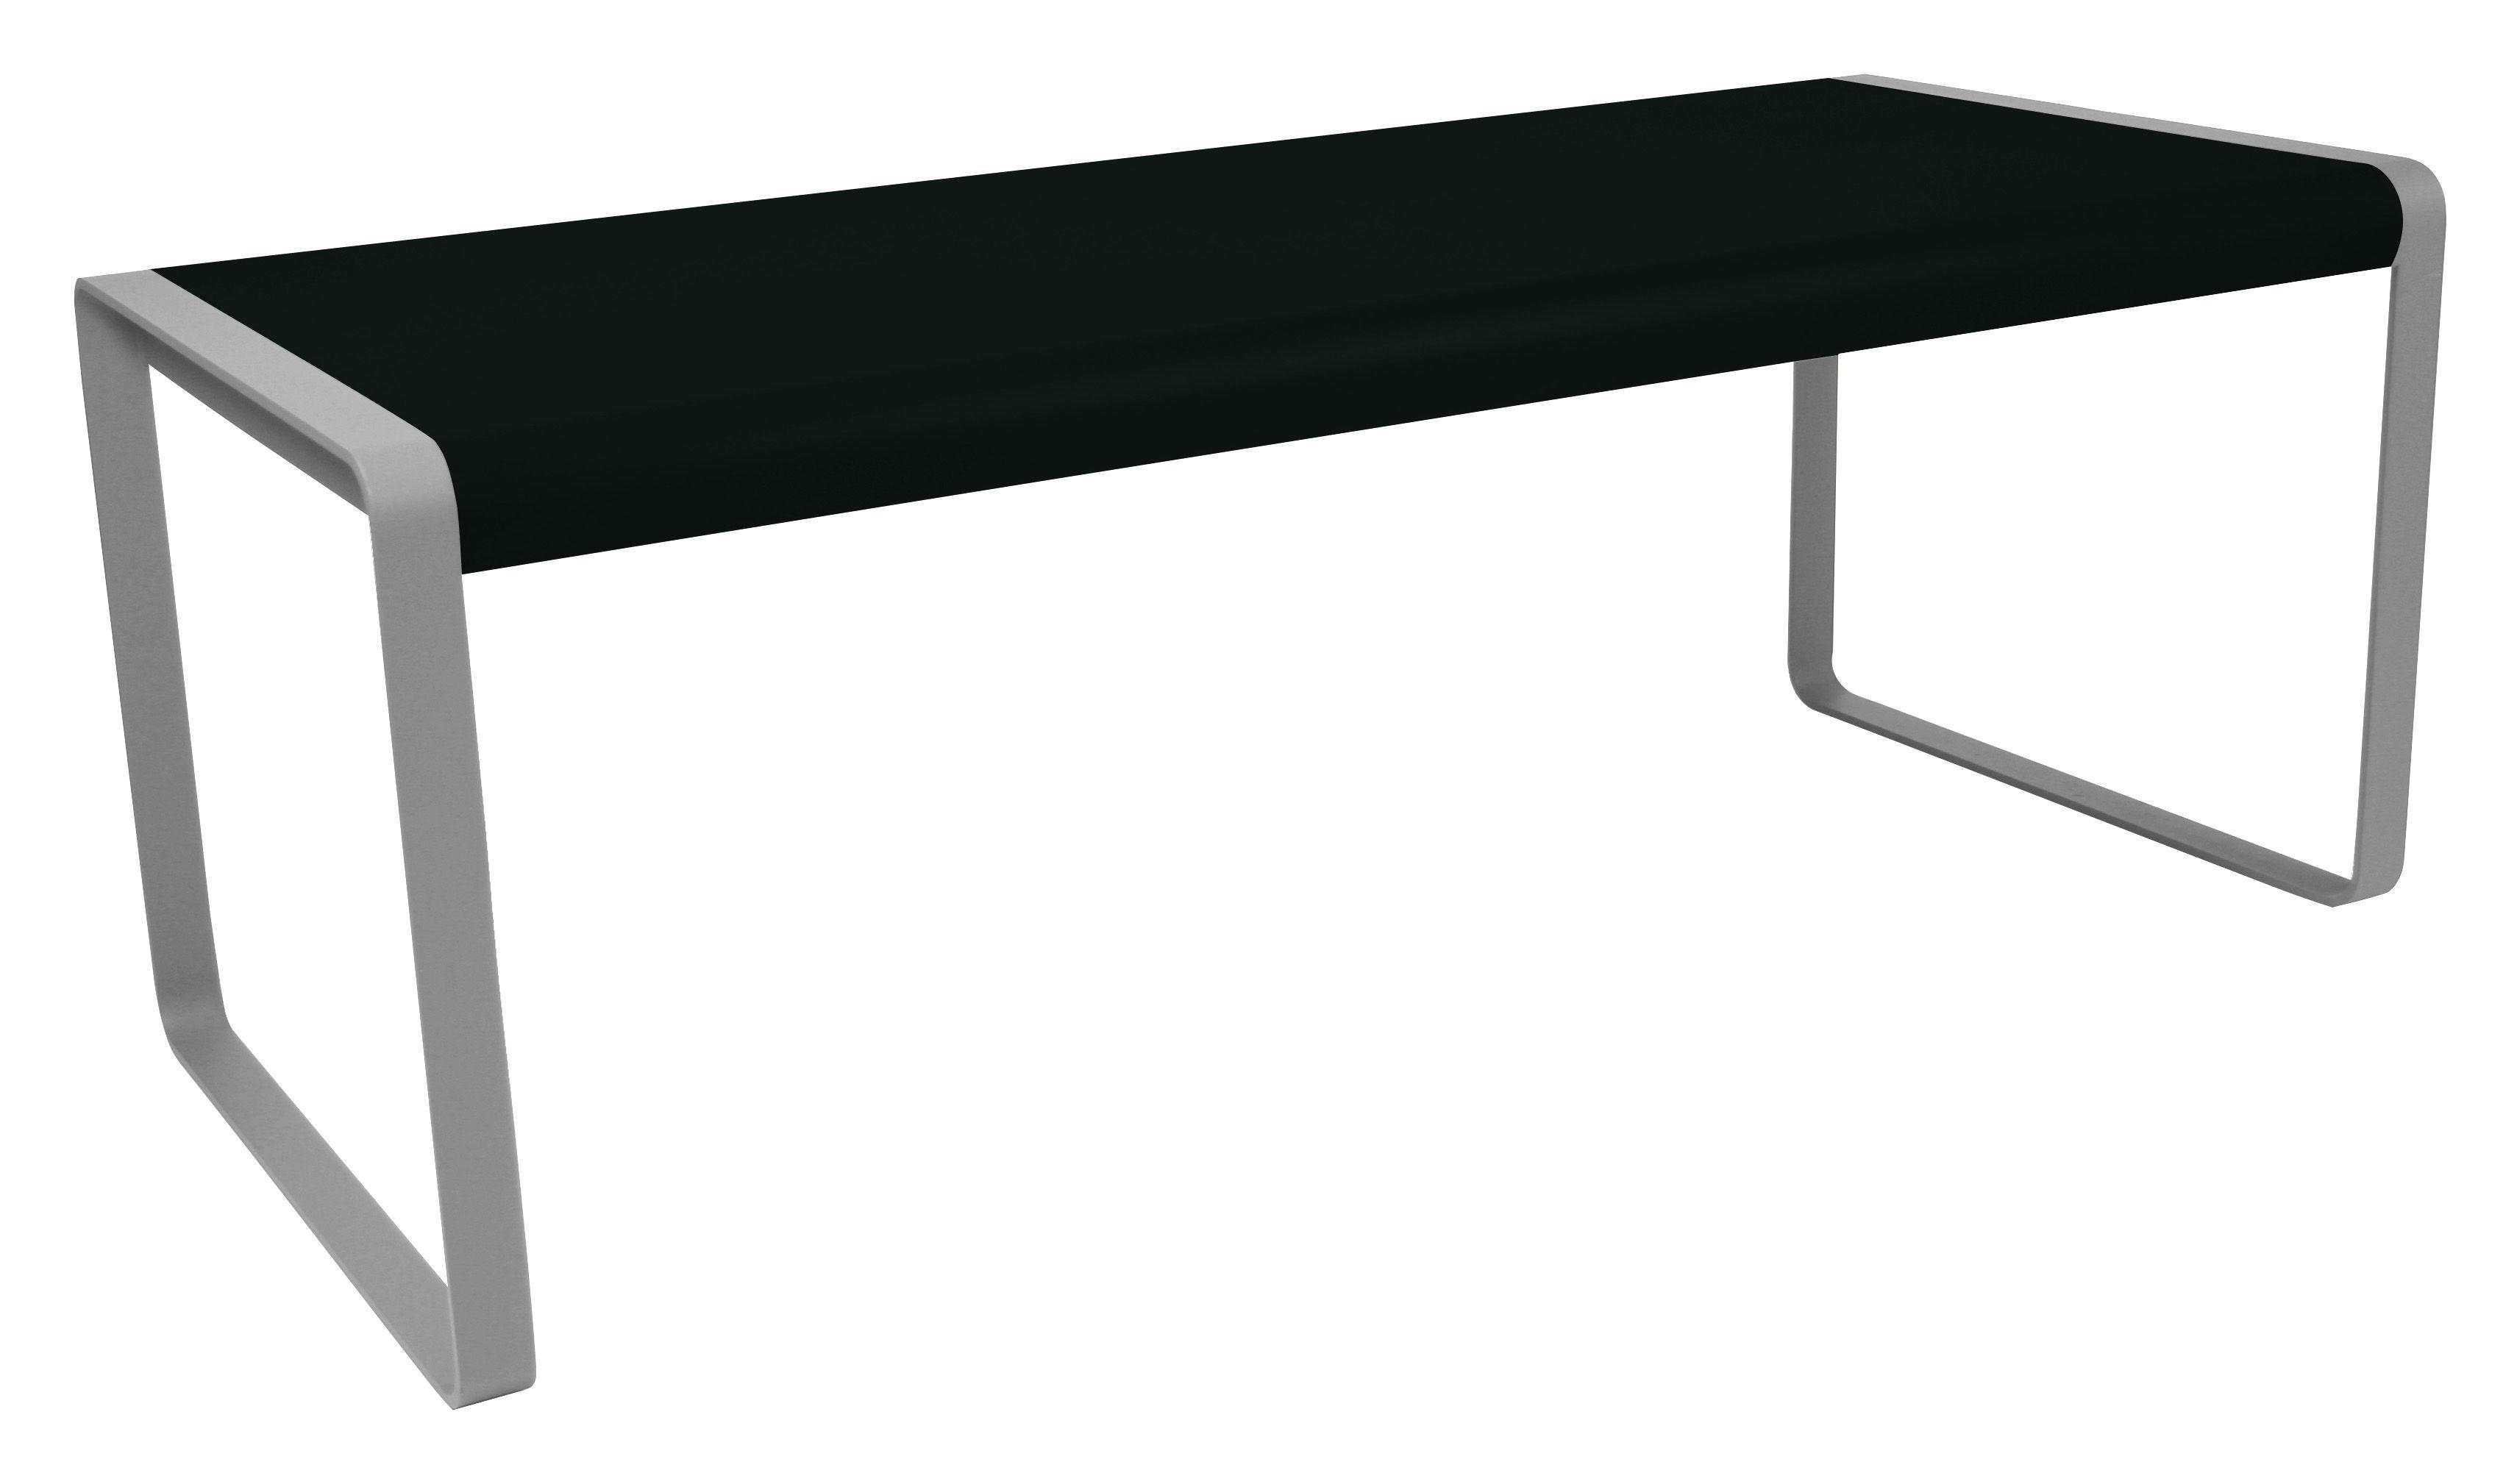 bellevie bicolore l 196 cm f r 8 bis 10 personen fermob tisch. Black Bedroom Furniture Sets. Home Design Ideas